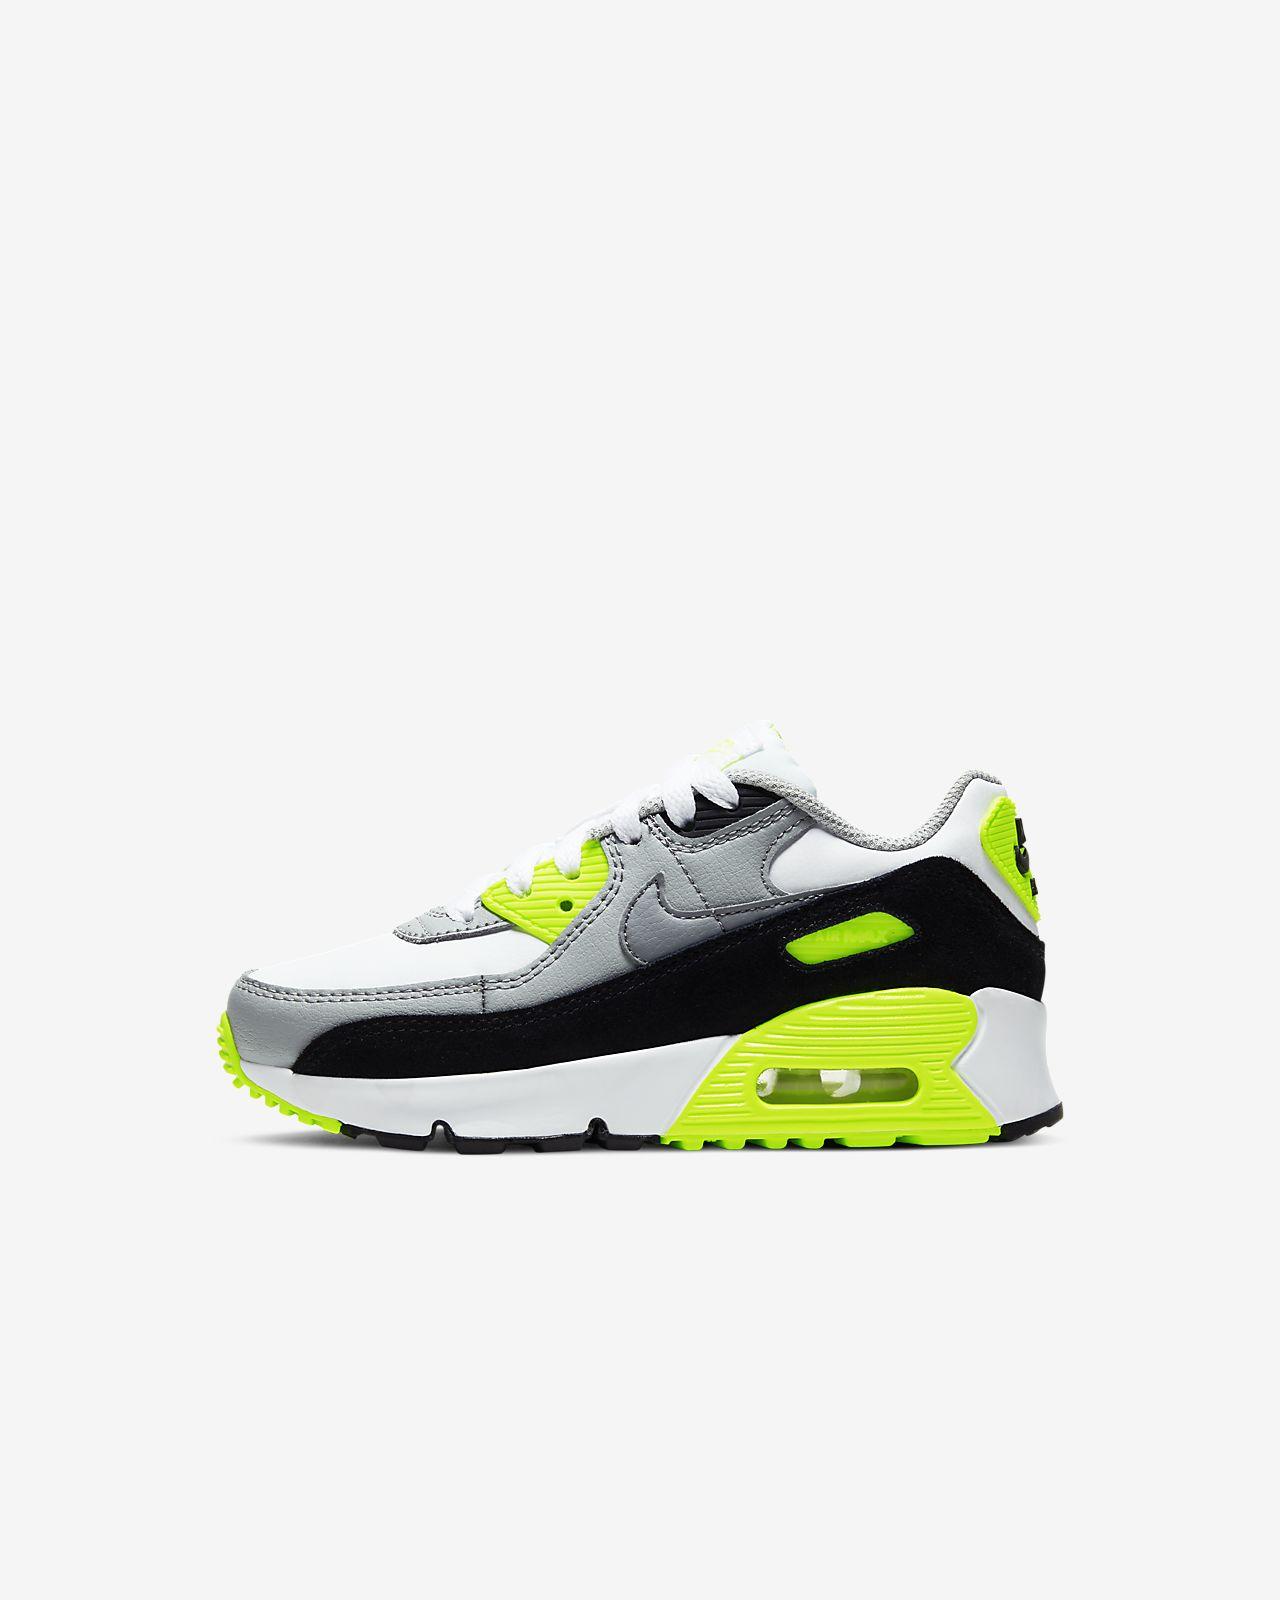 Bota Nike Air Max 90 pro malé děti